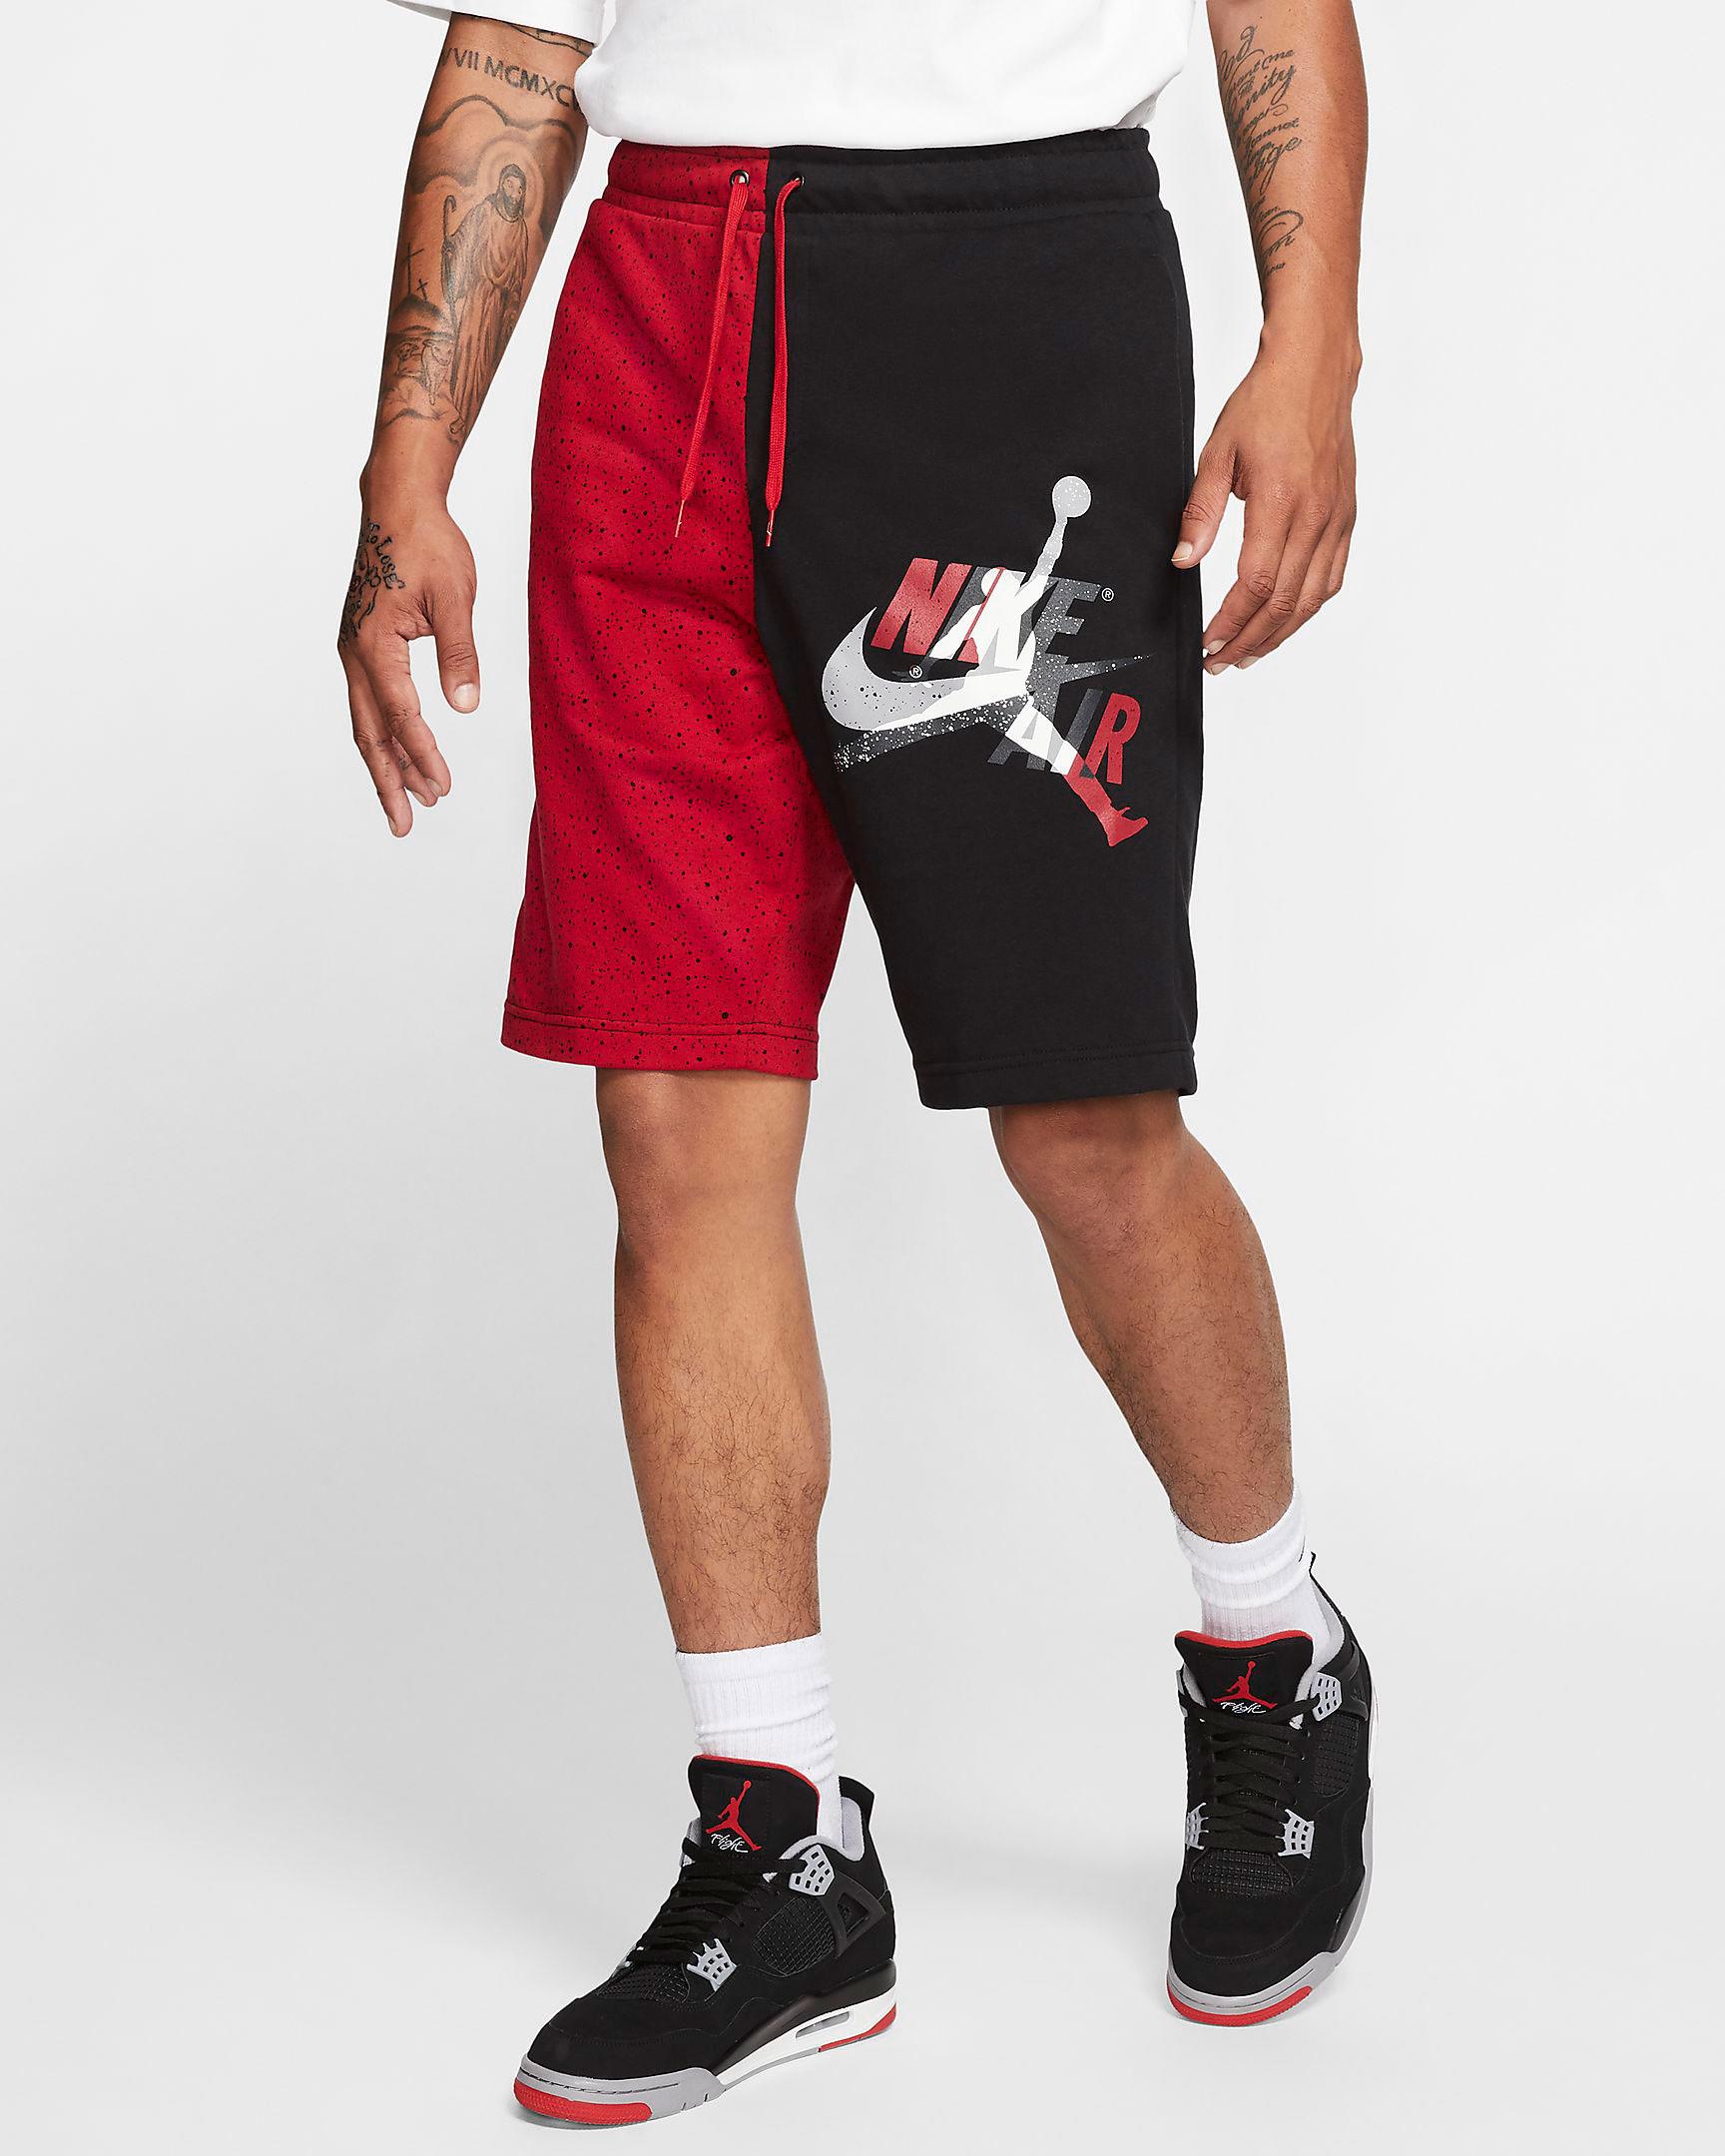 jordan-jumpman-classics-shorts-black-red-cement-grey